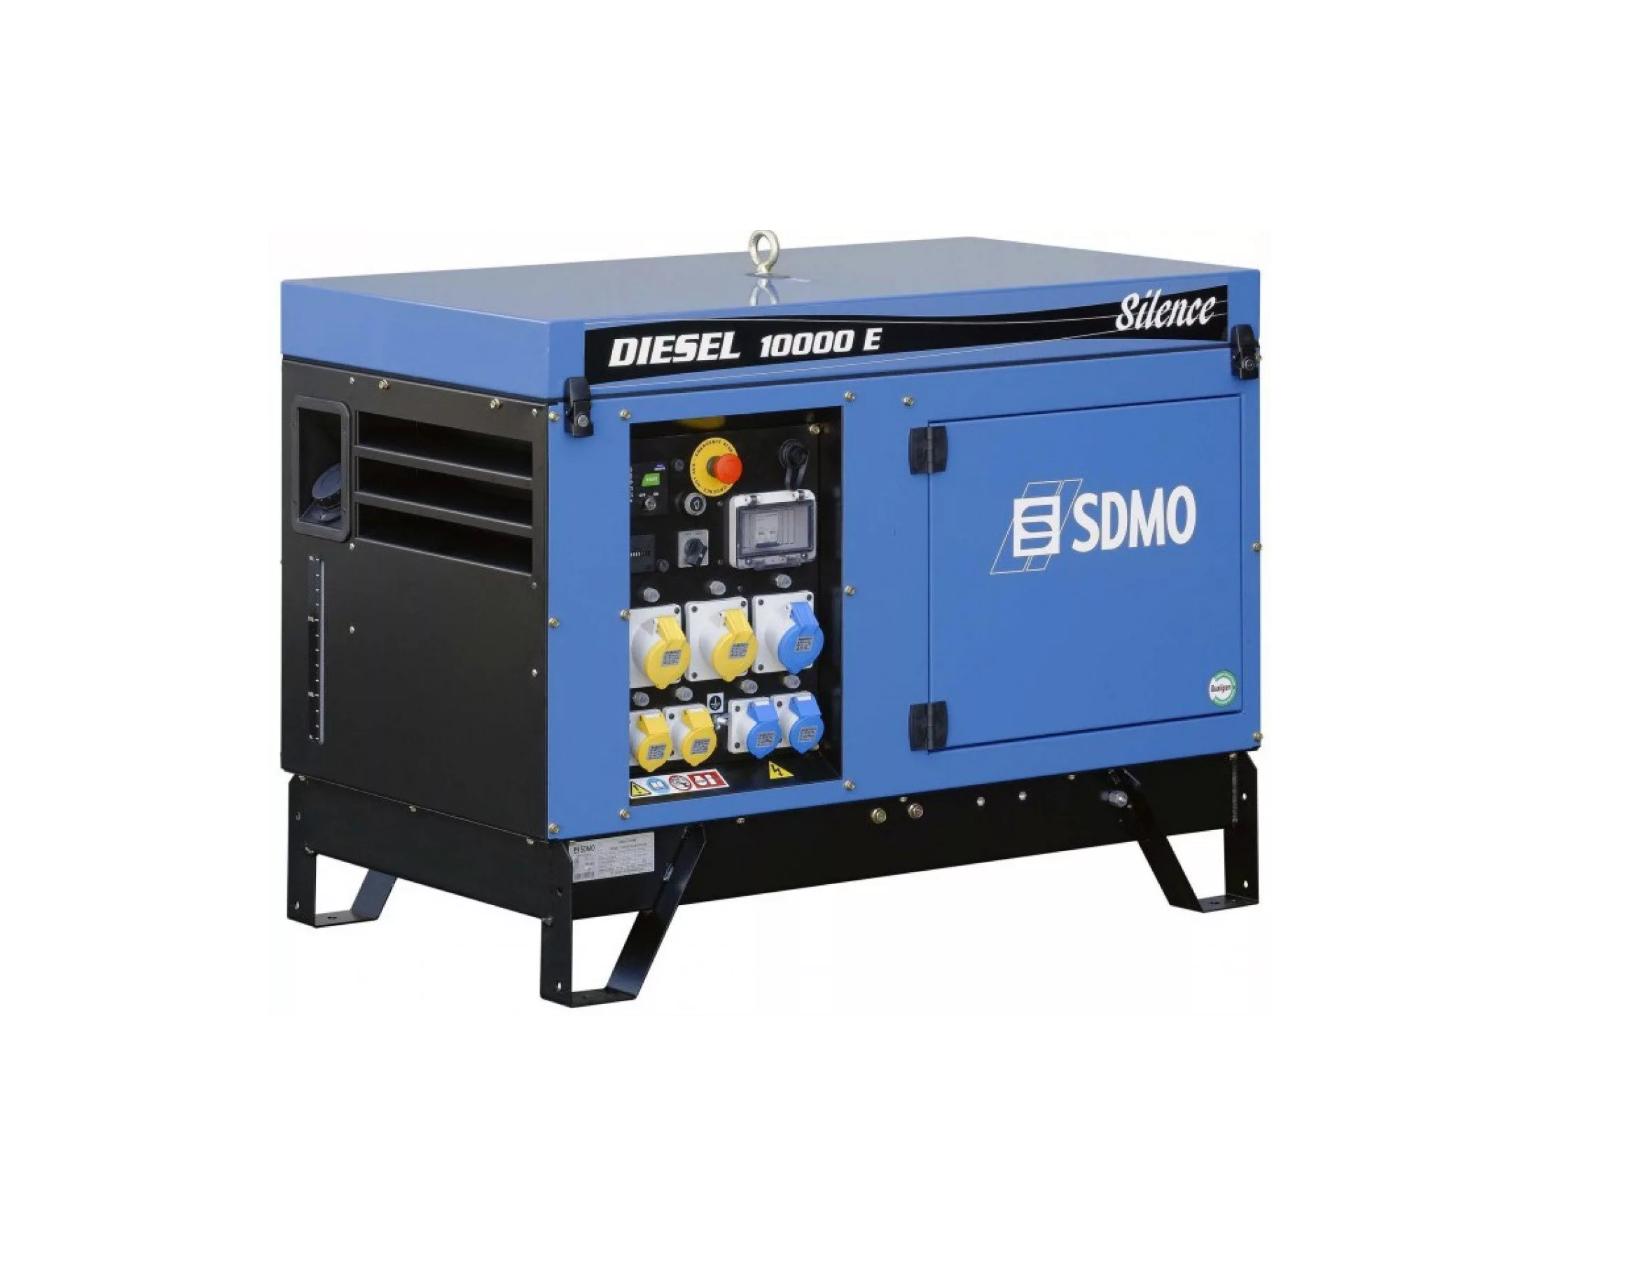 Дизельный генератор (электростанция) SDMO DIESEL 10000 E AVR SILENCE